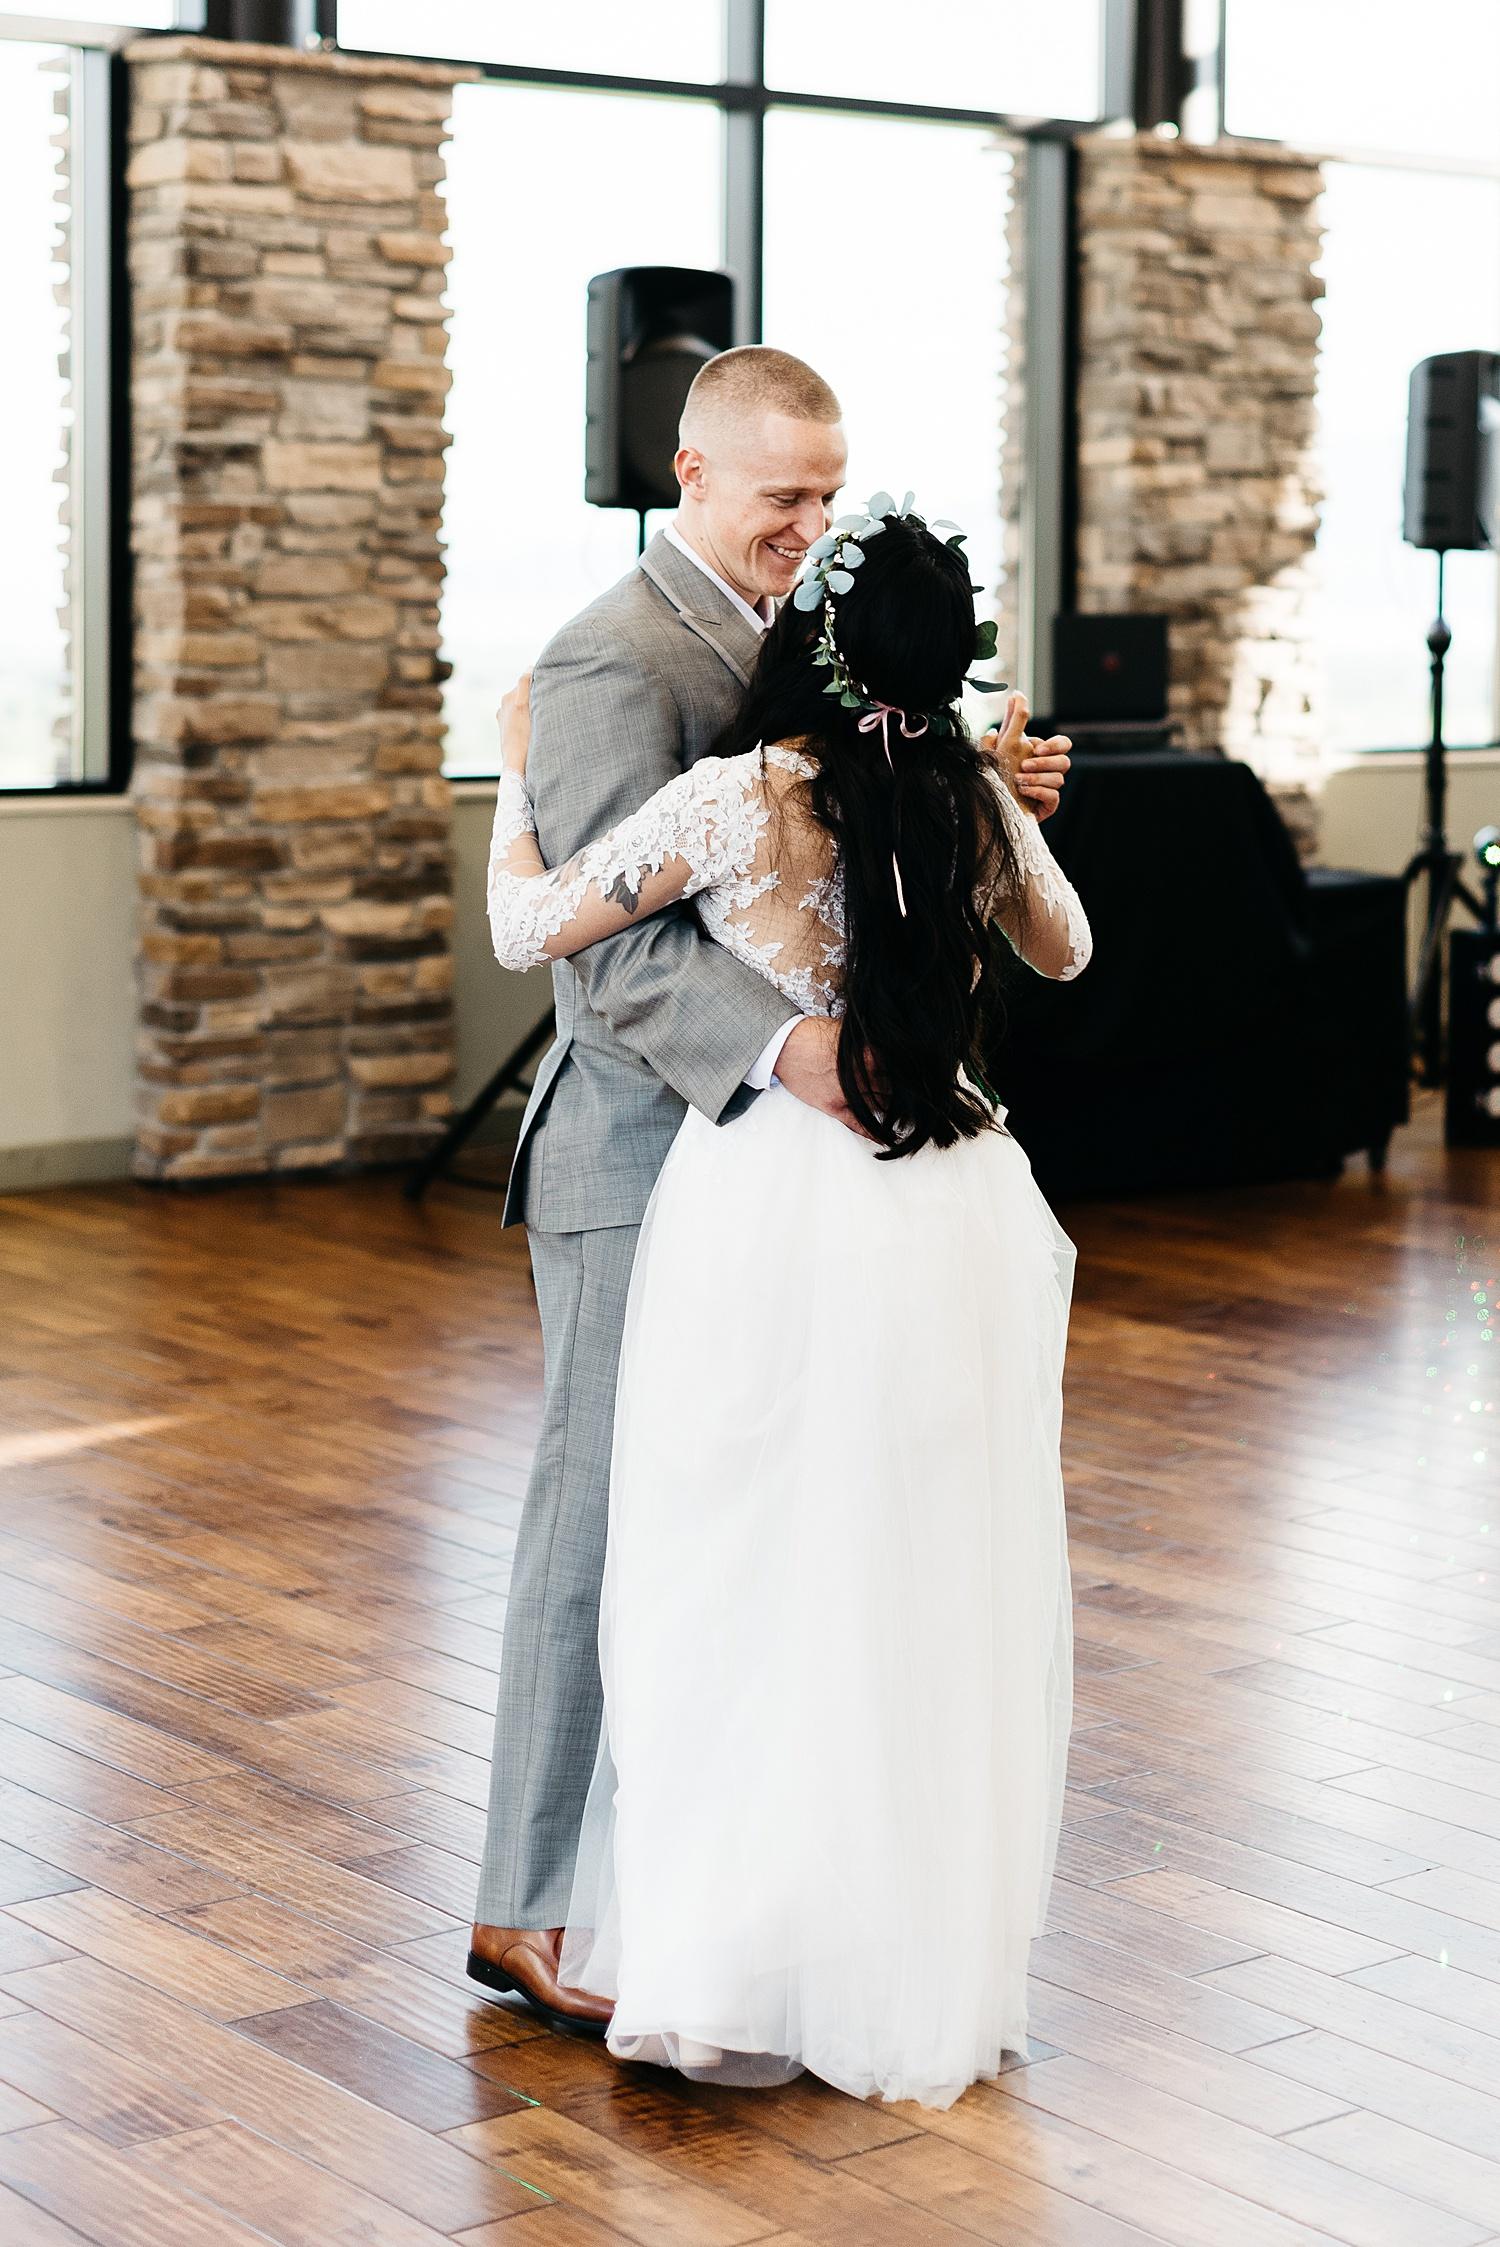 Zandra Barriga Photo - Darian and Colton Wedding_0059.jpg